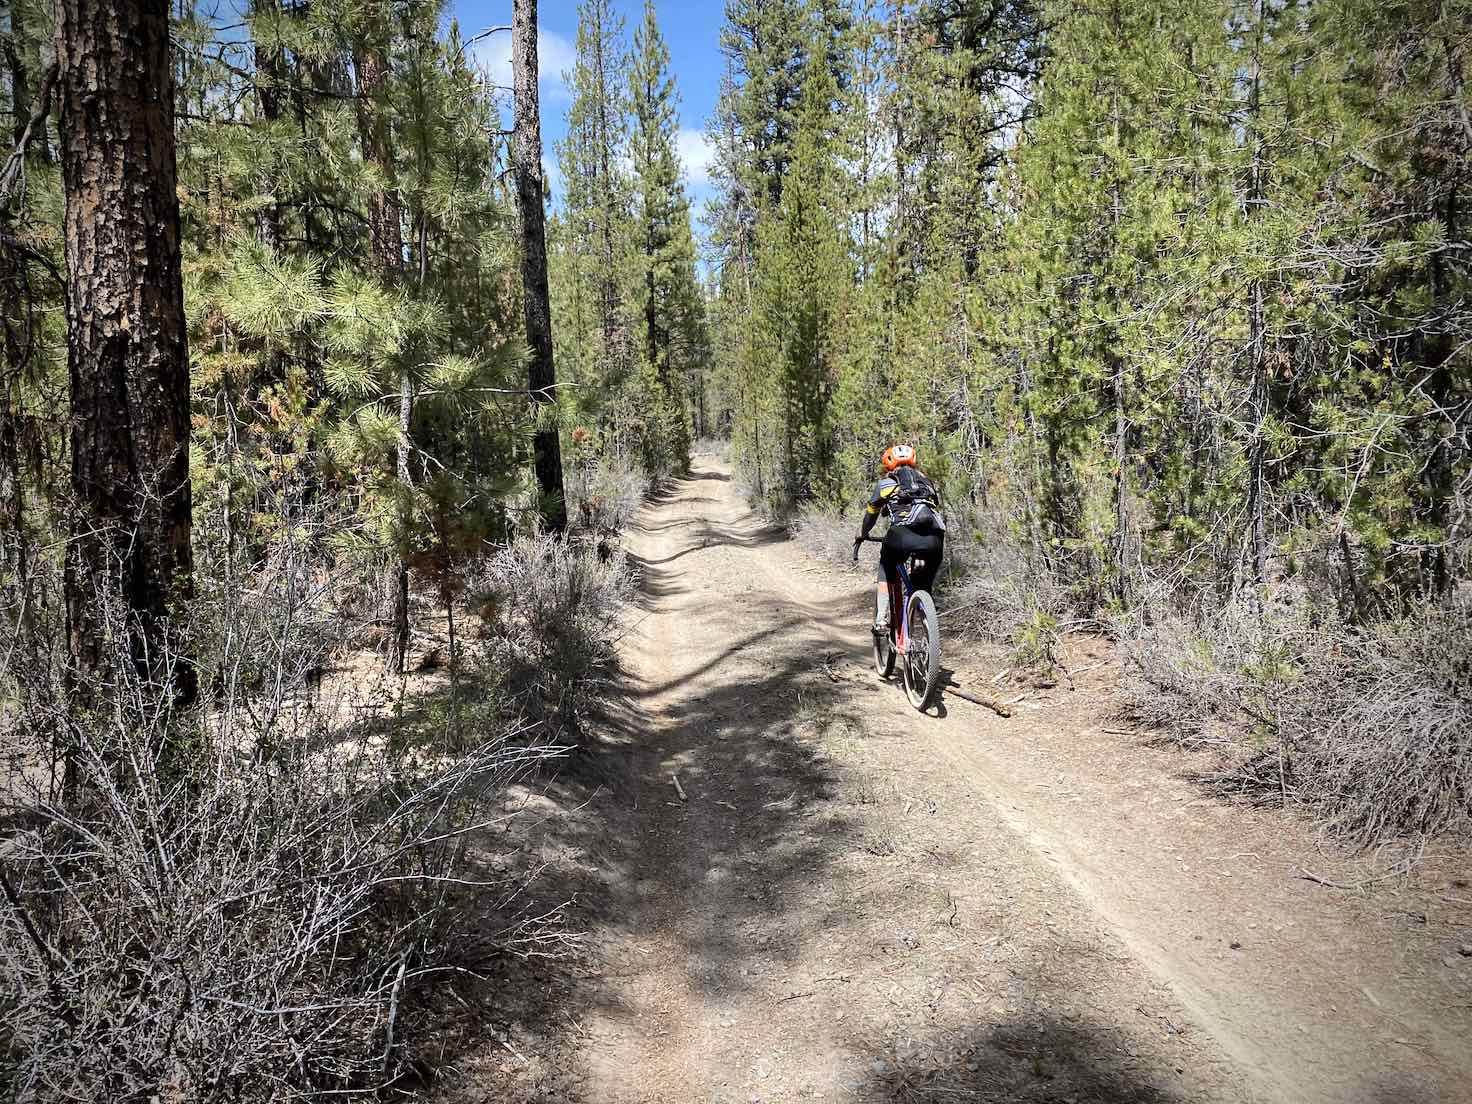 Scrub pine trees and cyclist on dirt road on east side of Klamath Marsh.